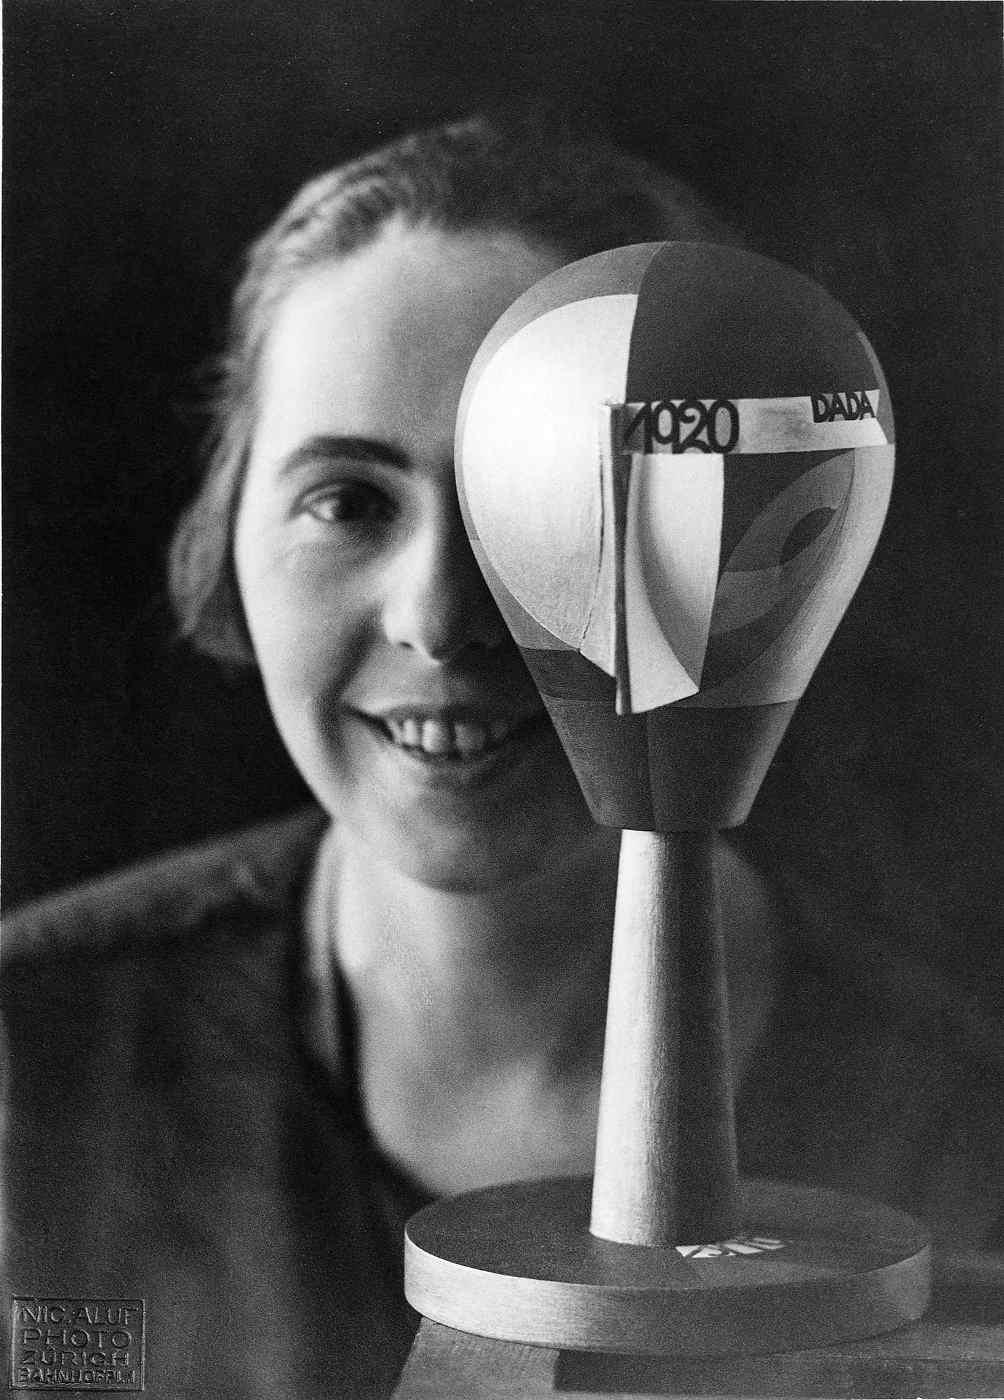 Sophie Taeuber with Dada-Head, Zurich 1920 | Photo: Nic Aluf – Archiv Stiftung Arp e. V., Berlin/Rolandswerth